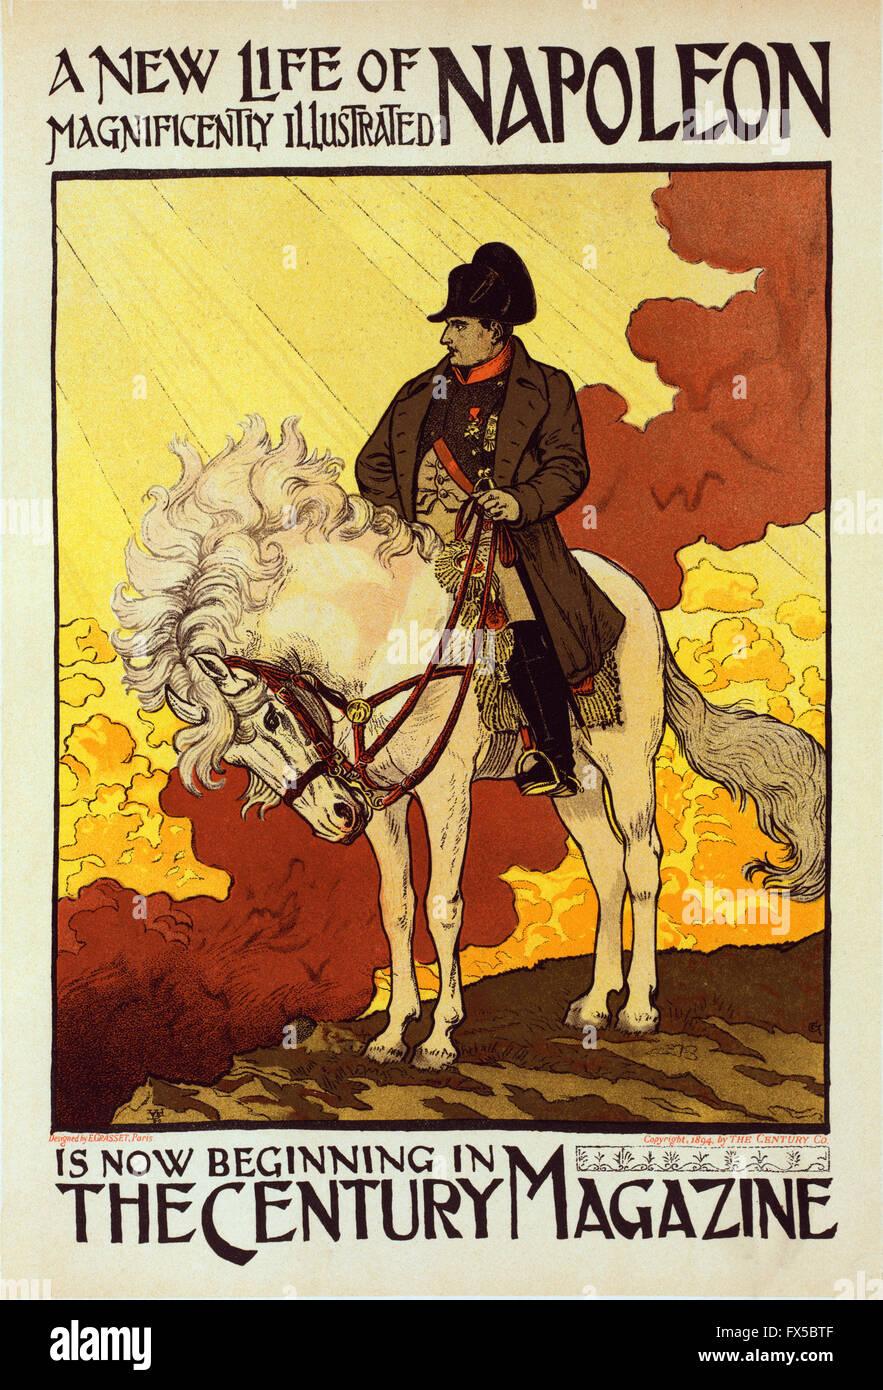 Eugene Grasset - A New Life Of Napoleon - Stock Image